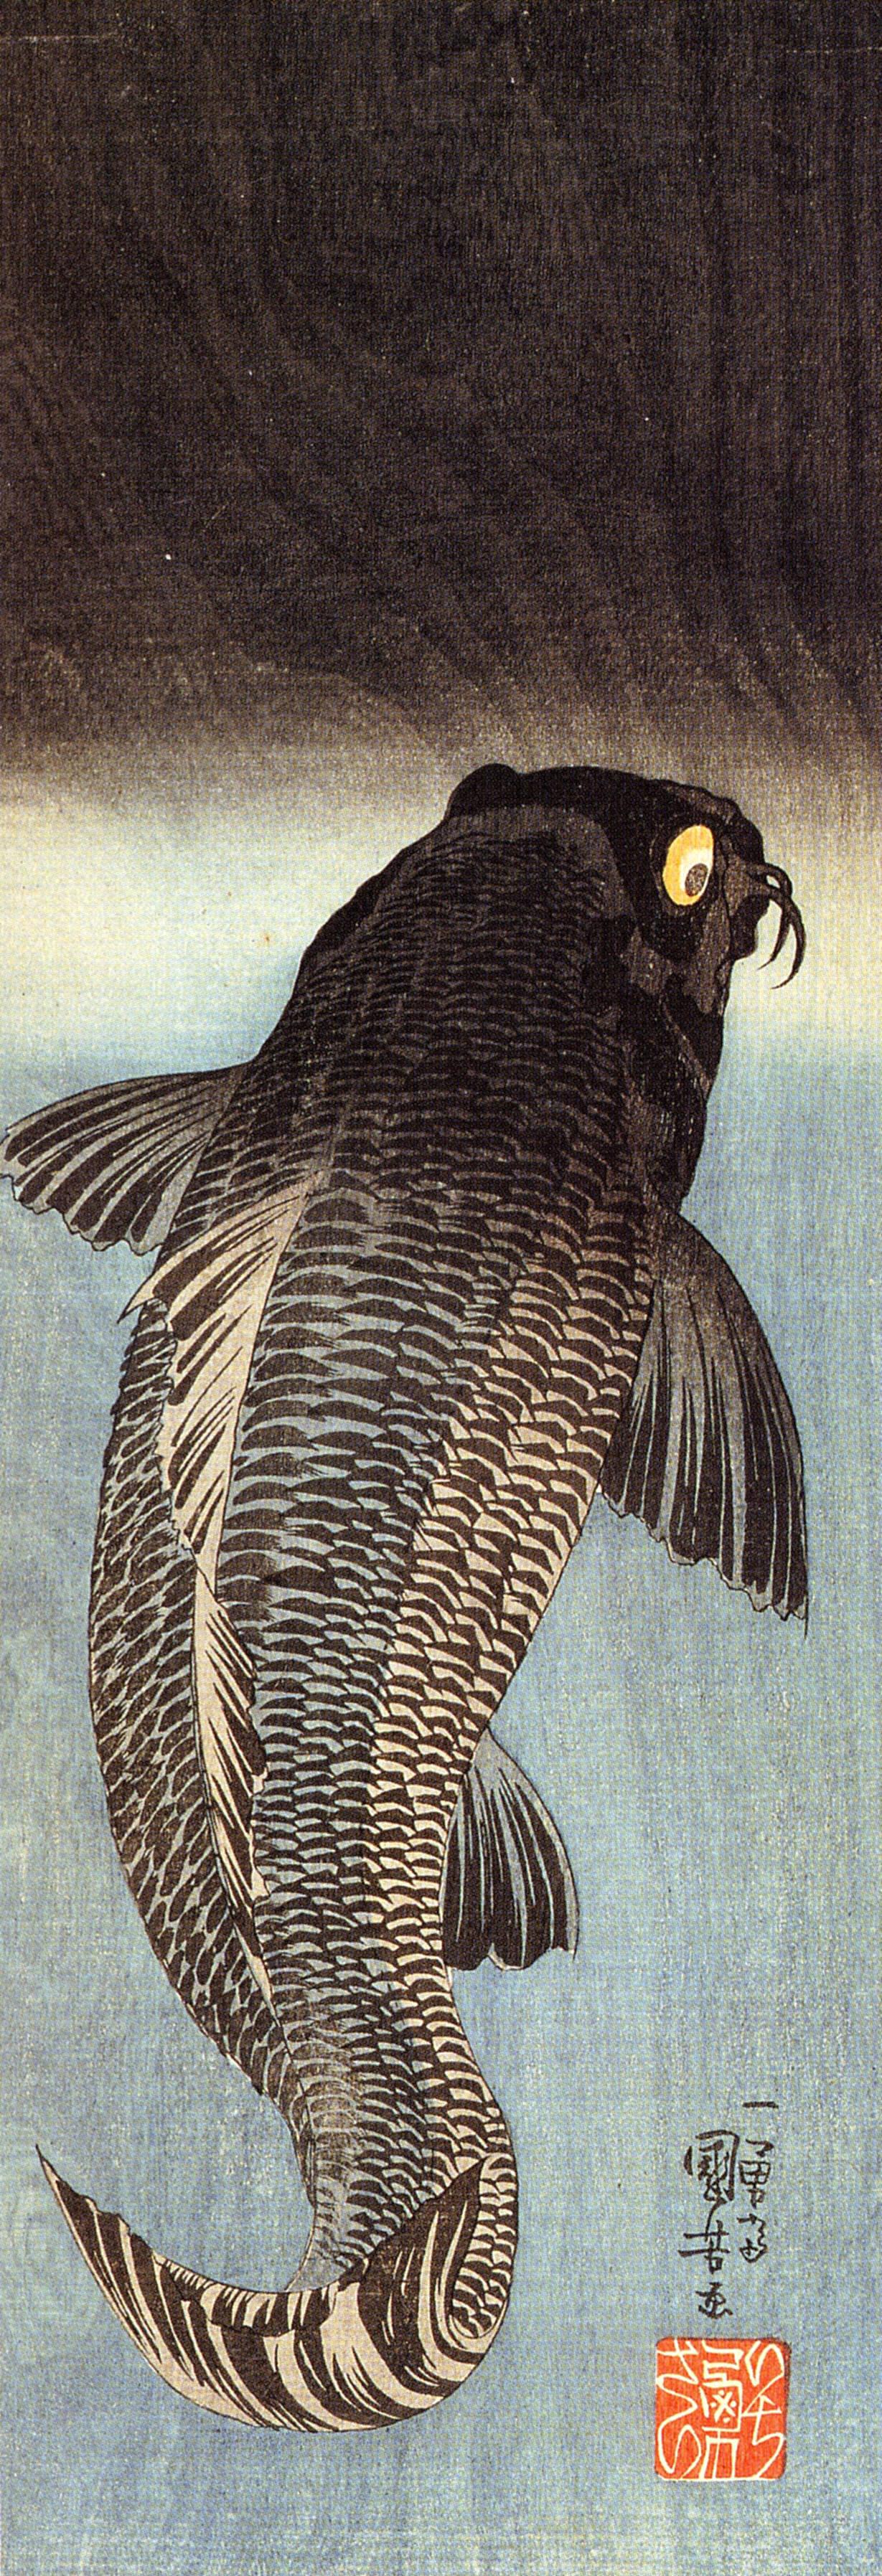 http://upload.wikimedia.org/wikipedia/commons/b/bd/Kuniyoshi_Utagawa%2C_Black_carp_1.jpg